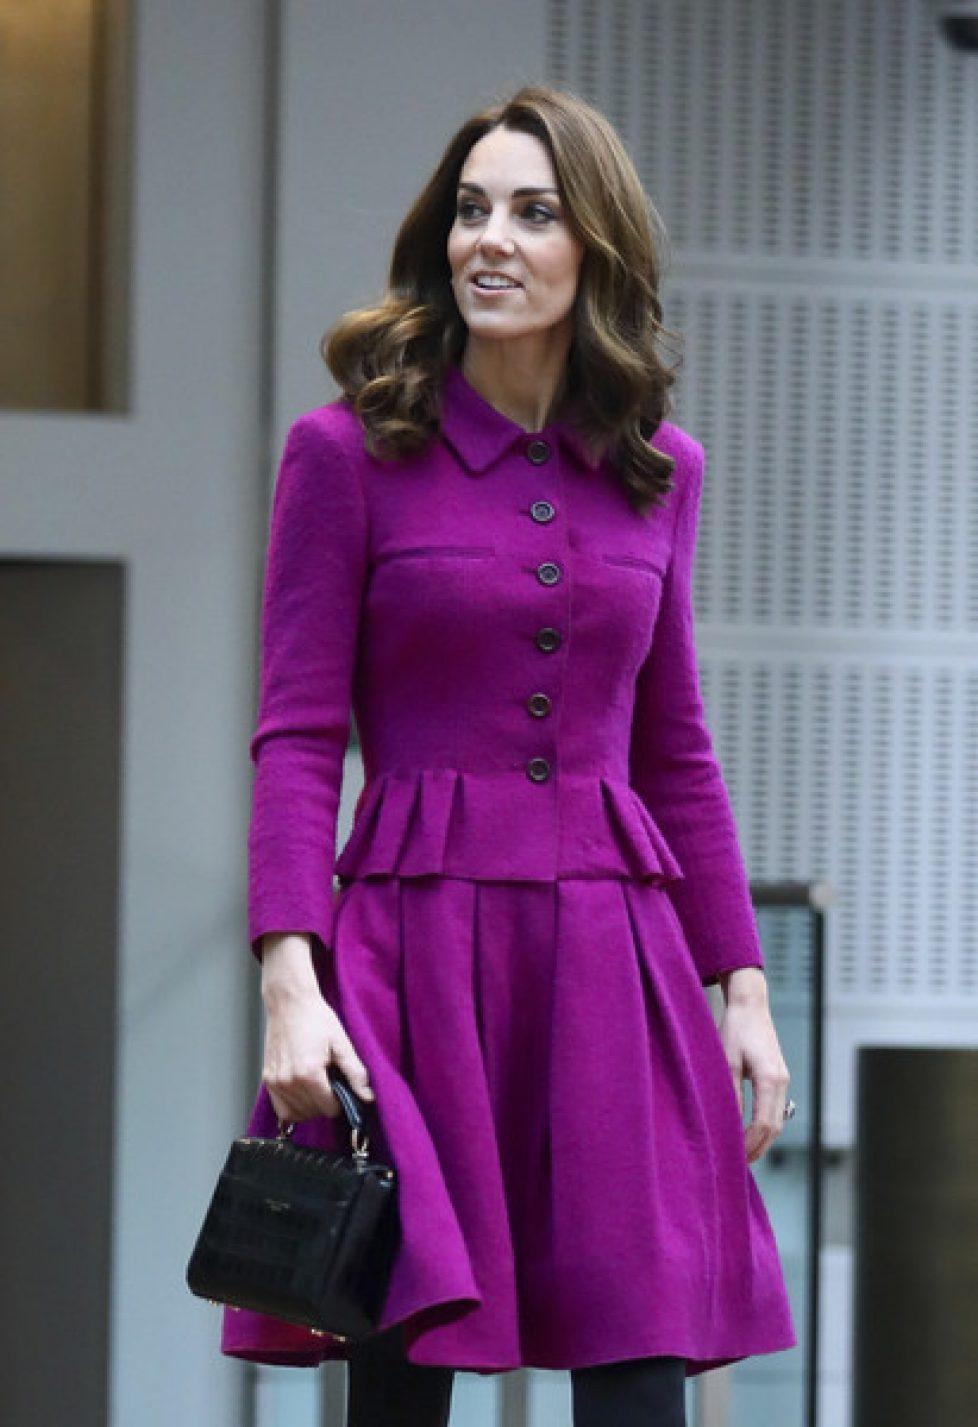 Duchess+Cambridge+Visits+Royal+Opera+House+6e3Lc05_M-Gl